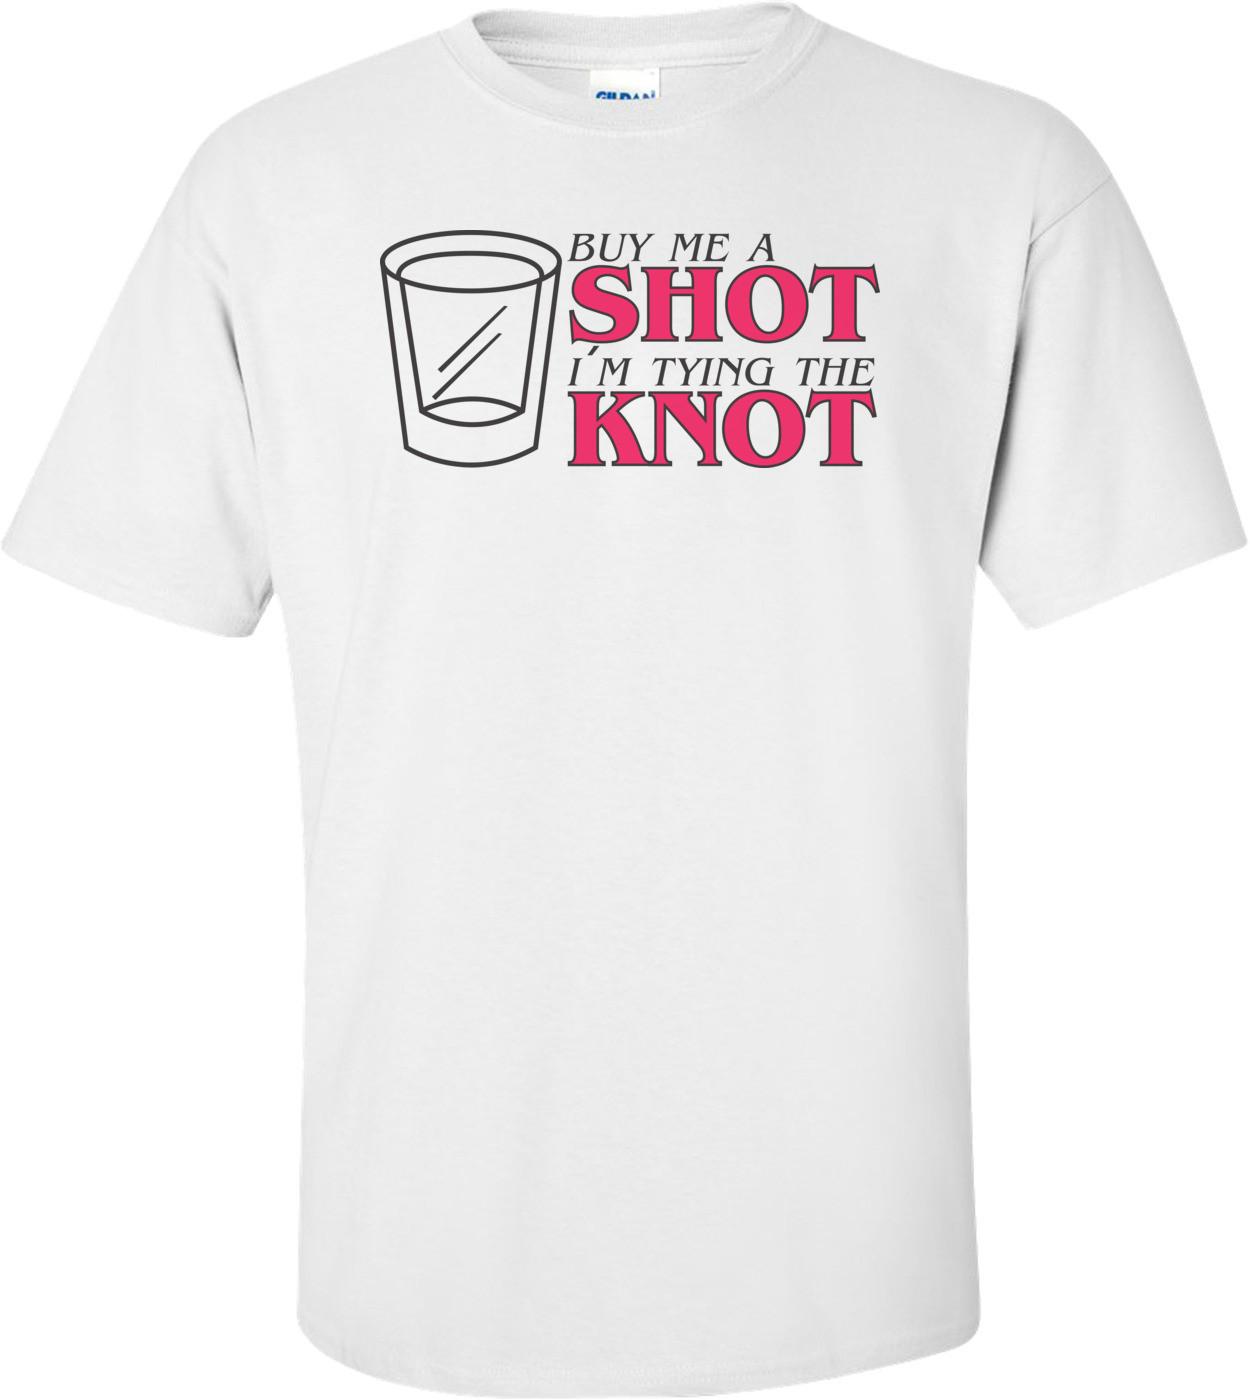 Buy Me A Shot I'm Tying The Knot 2 T-shirt